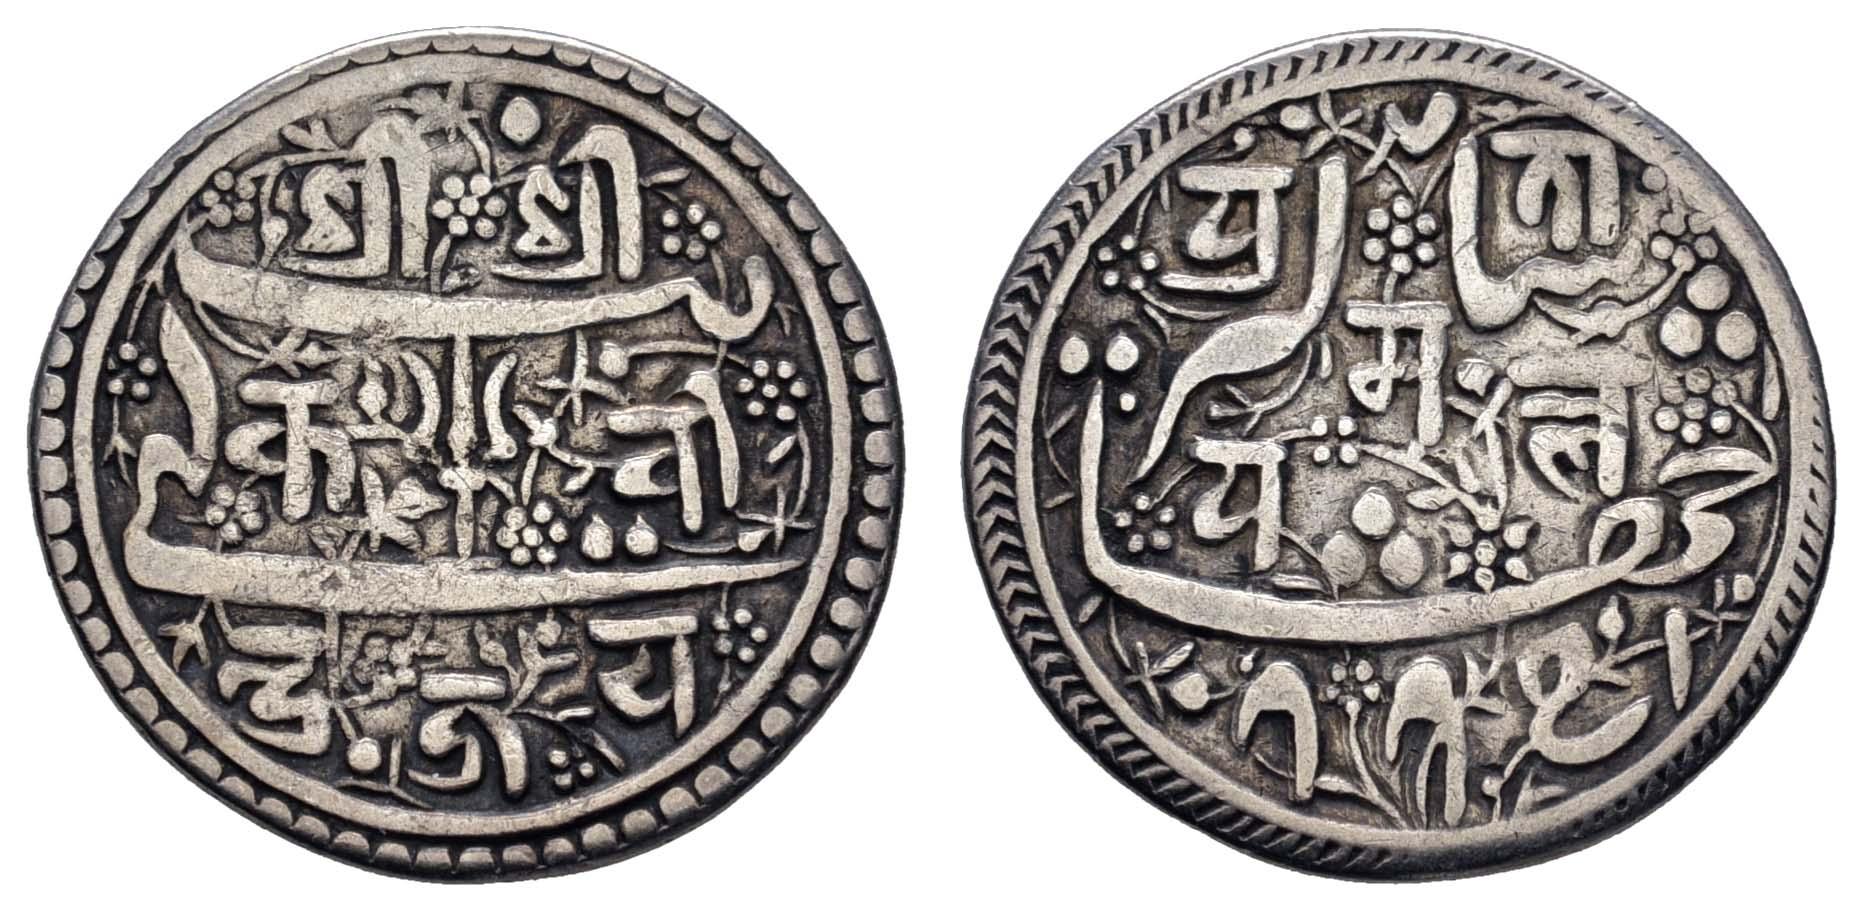 Lot 1961 - übersee Indien - Malla-Dynastie -  Auktionshaus Ulrich Felzmann GmbH & Co. KG Coins single lots